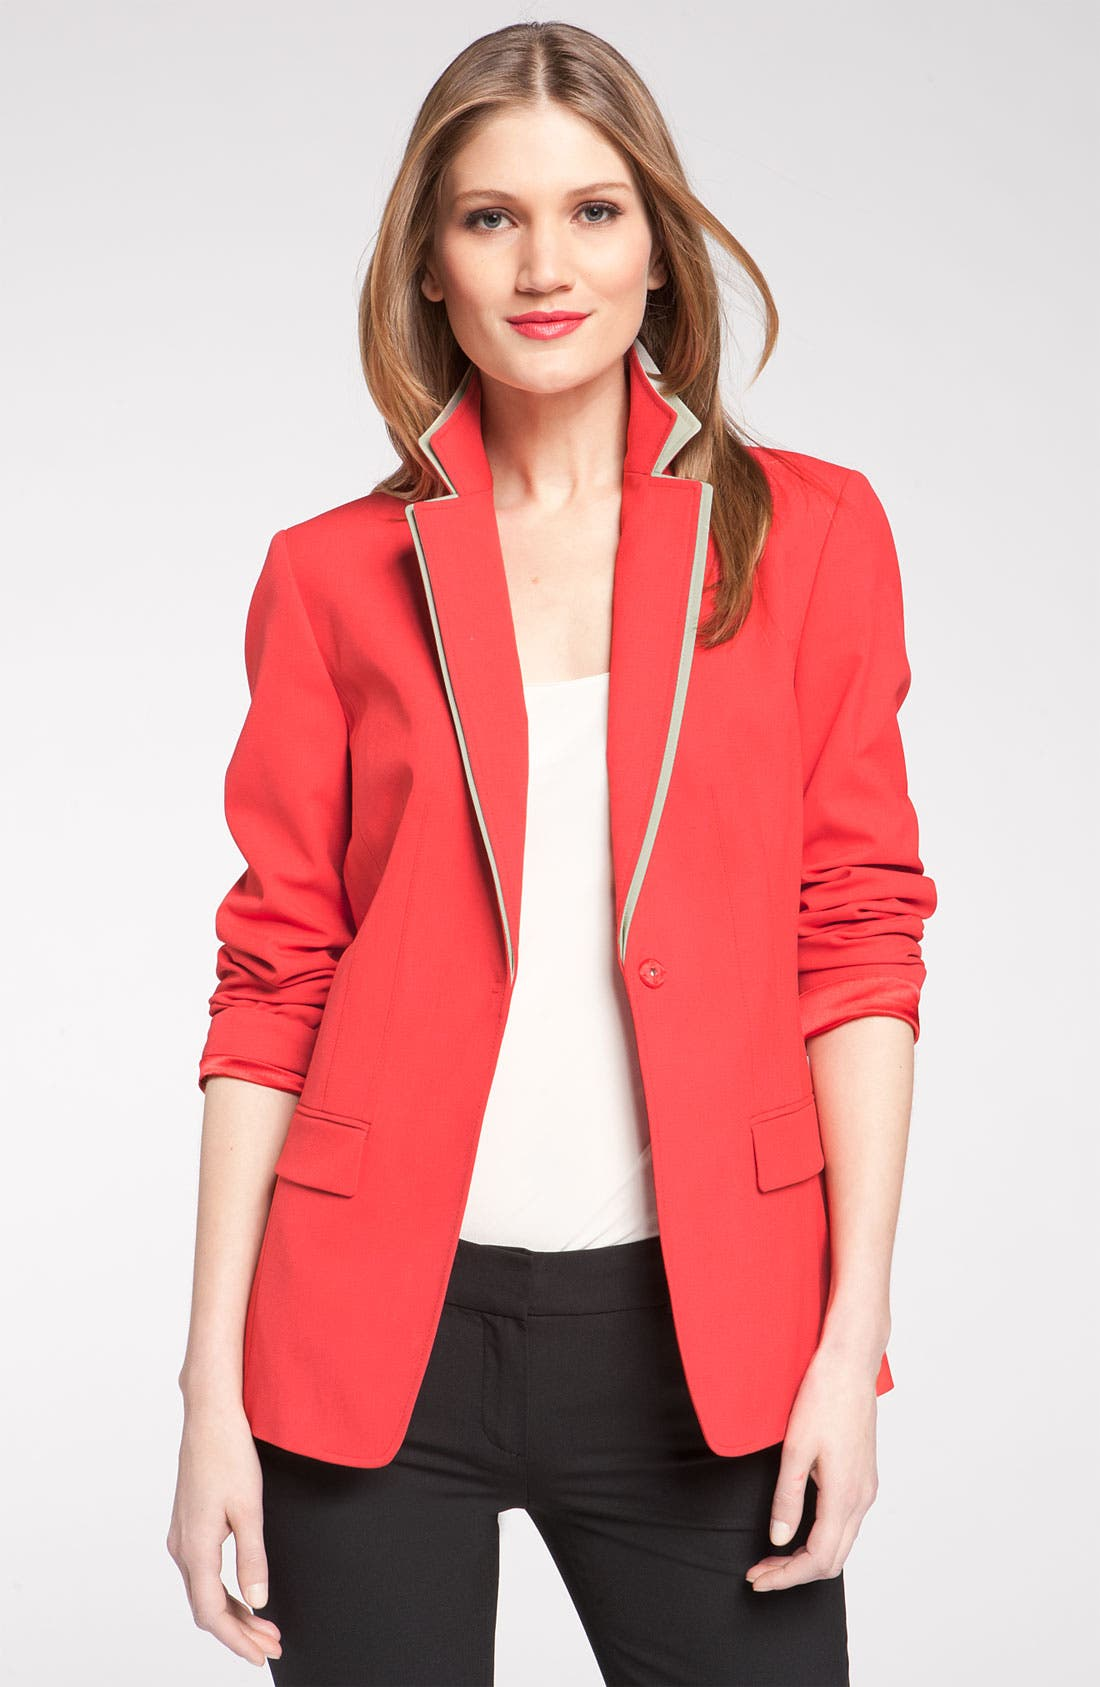 Alternate Image 2  - Elie Tahari Exclusive for Nordstrom 'Melissa' Contrast Trim Jacket (Nordstrom Exclusive)